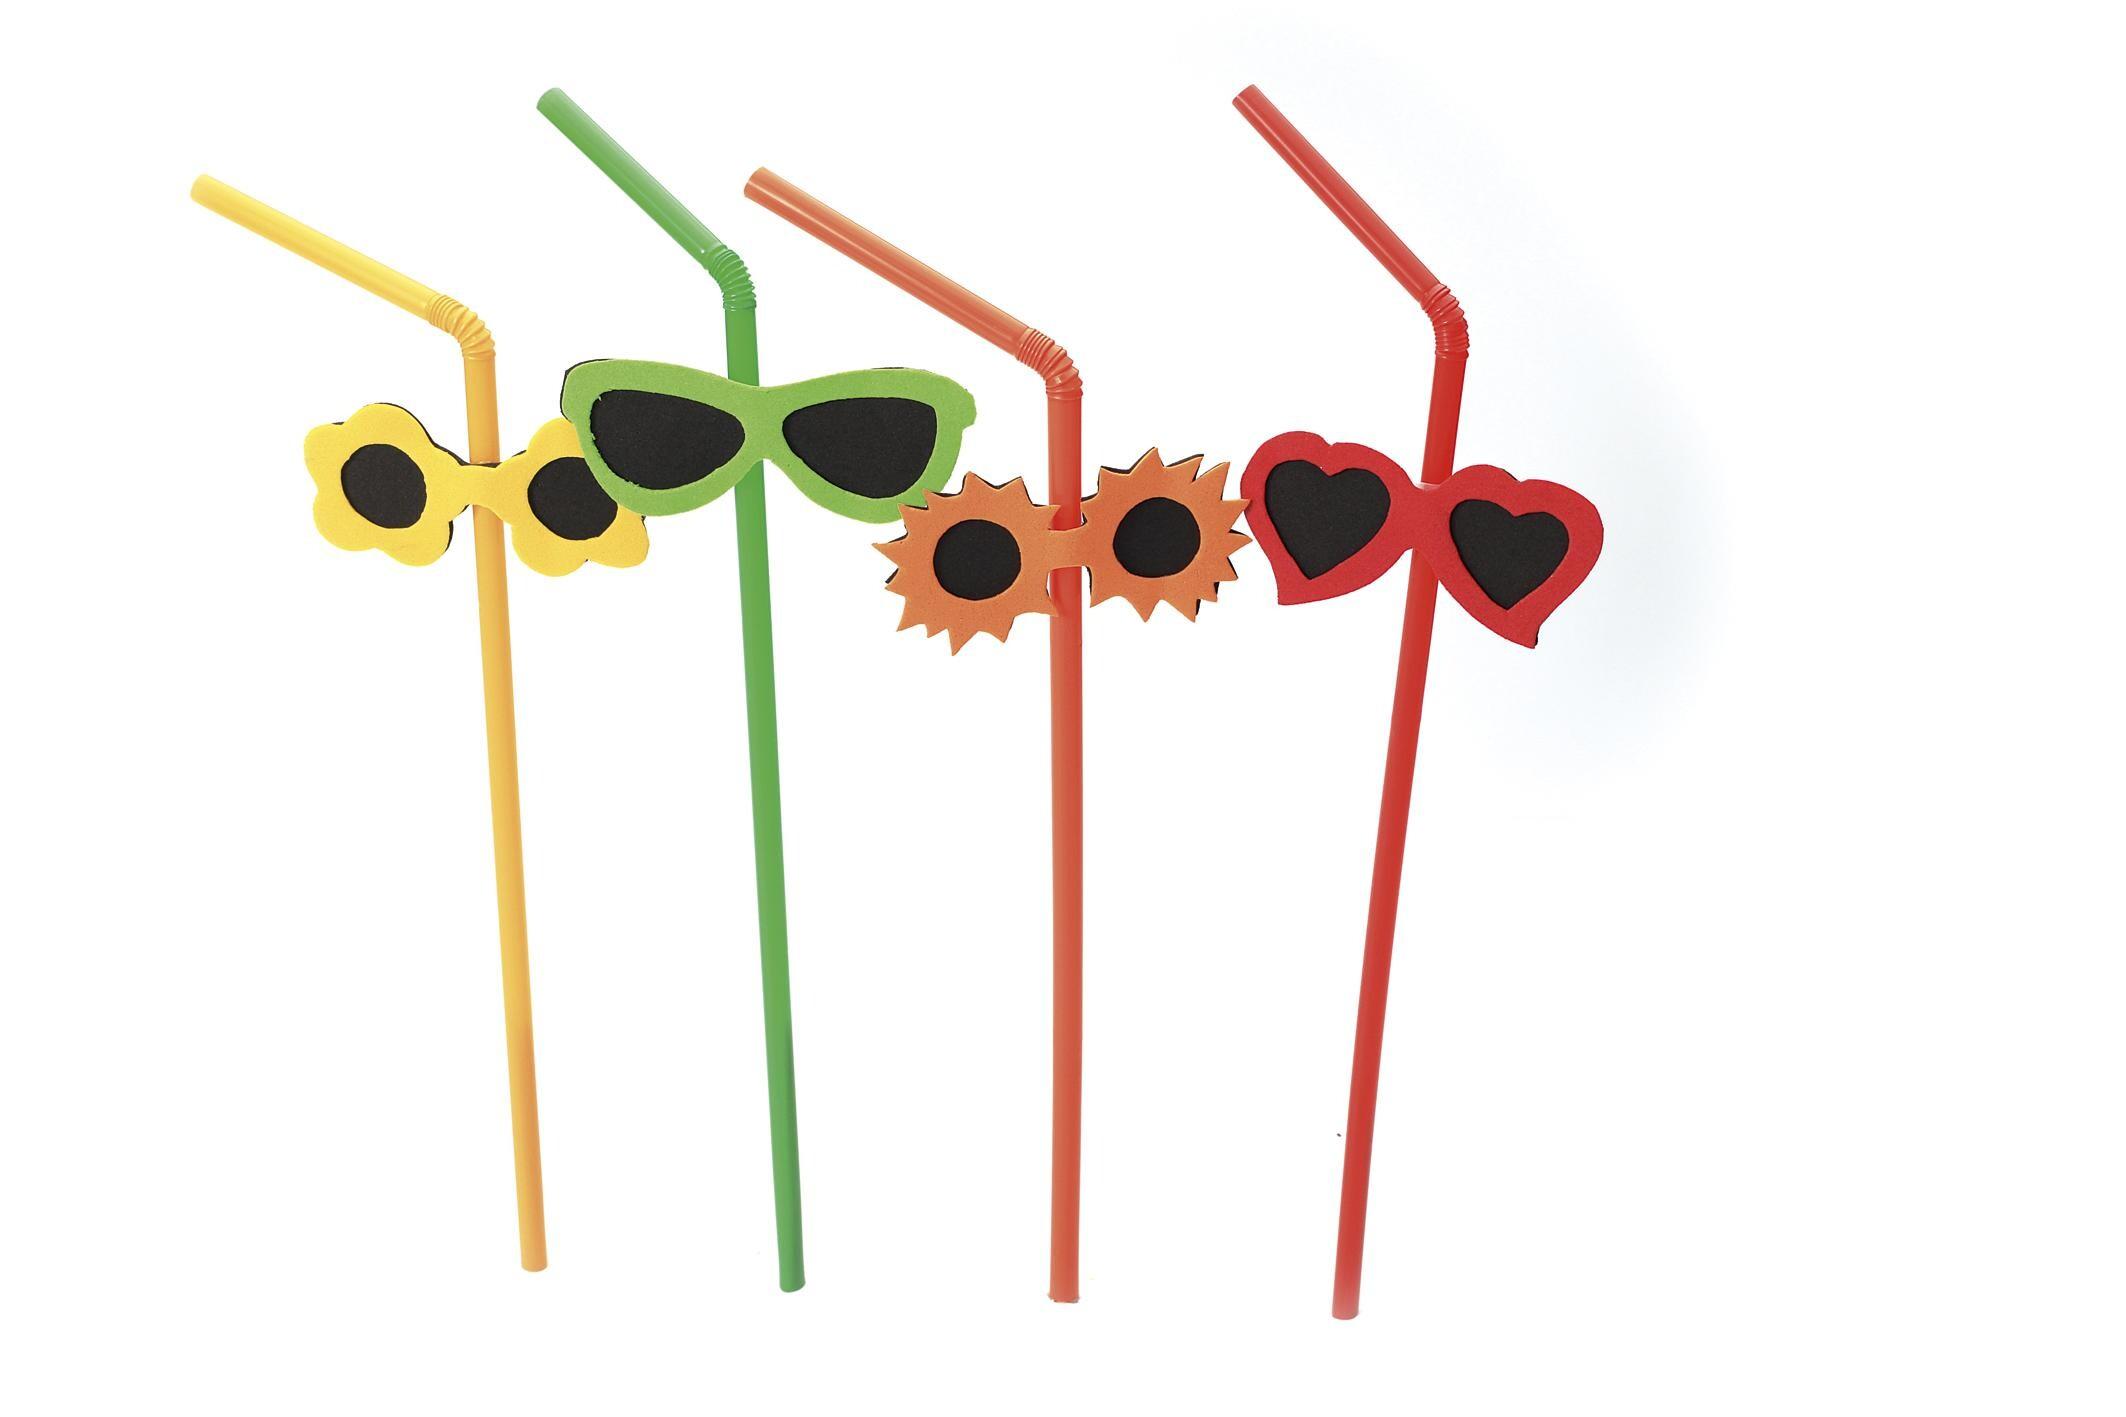 Flexible Straw with Sunn Glasses 5mm 24cm 100pcs 24008 Sier Disposables